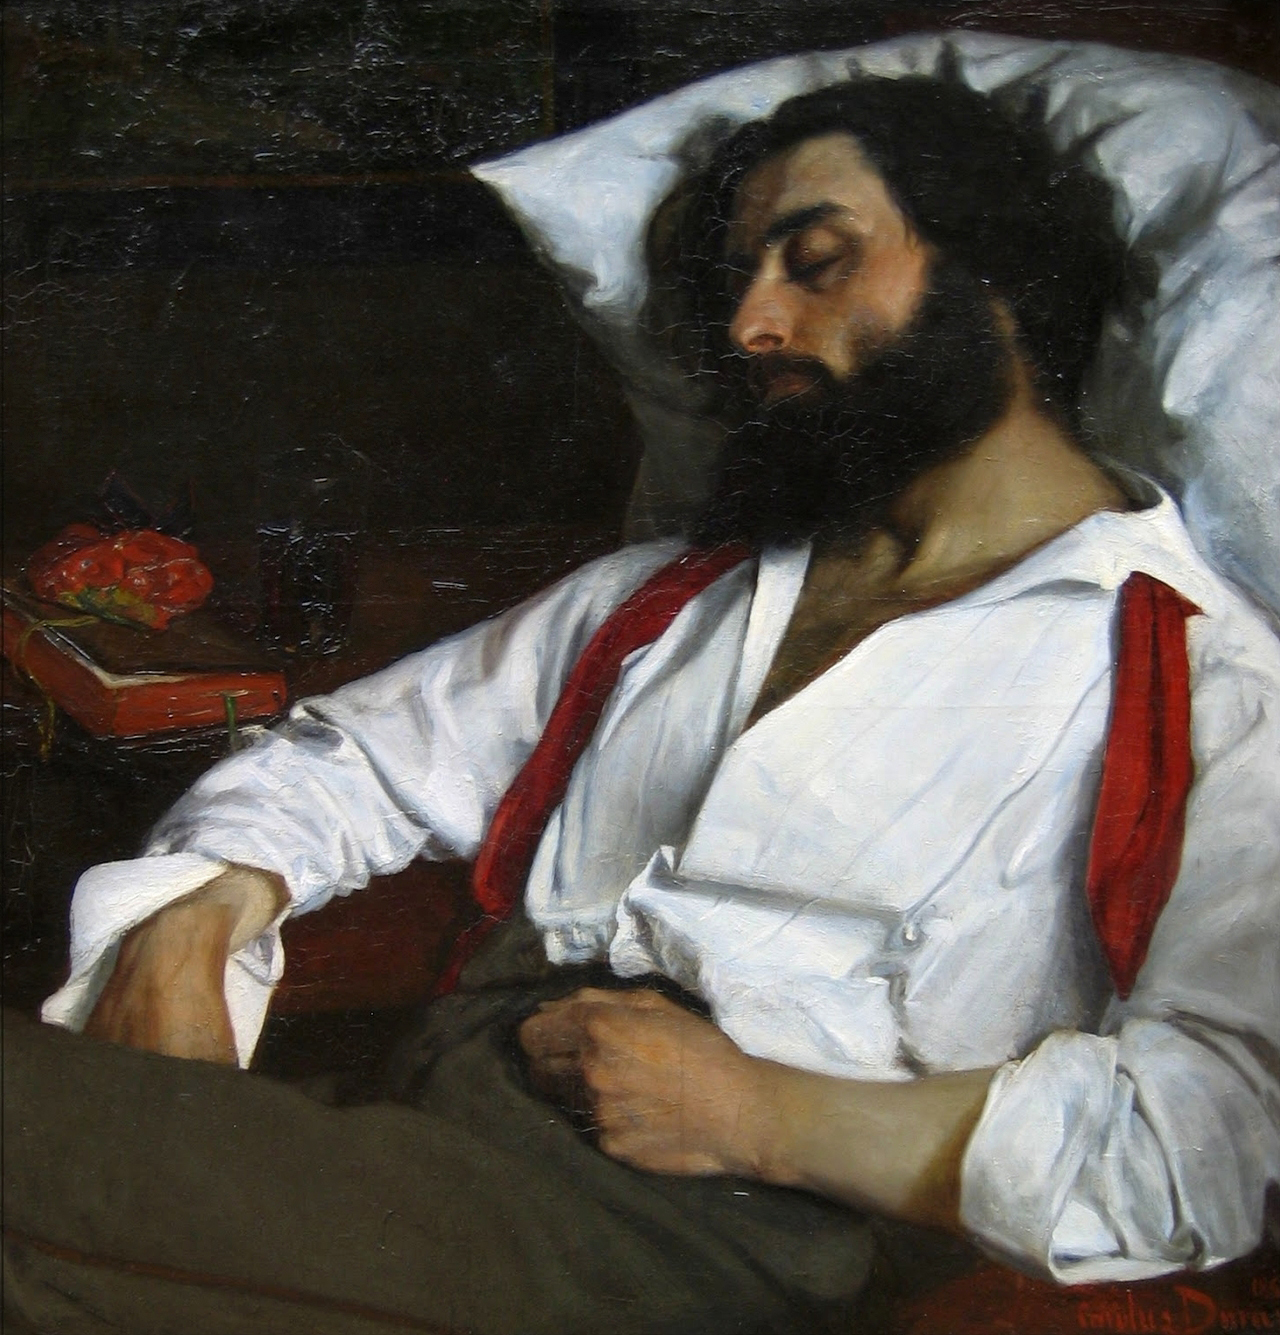 Charles Auguste Emile CAROLUS-DURAN, Homme endormi, art, insight, coaching, sommeil